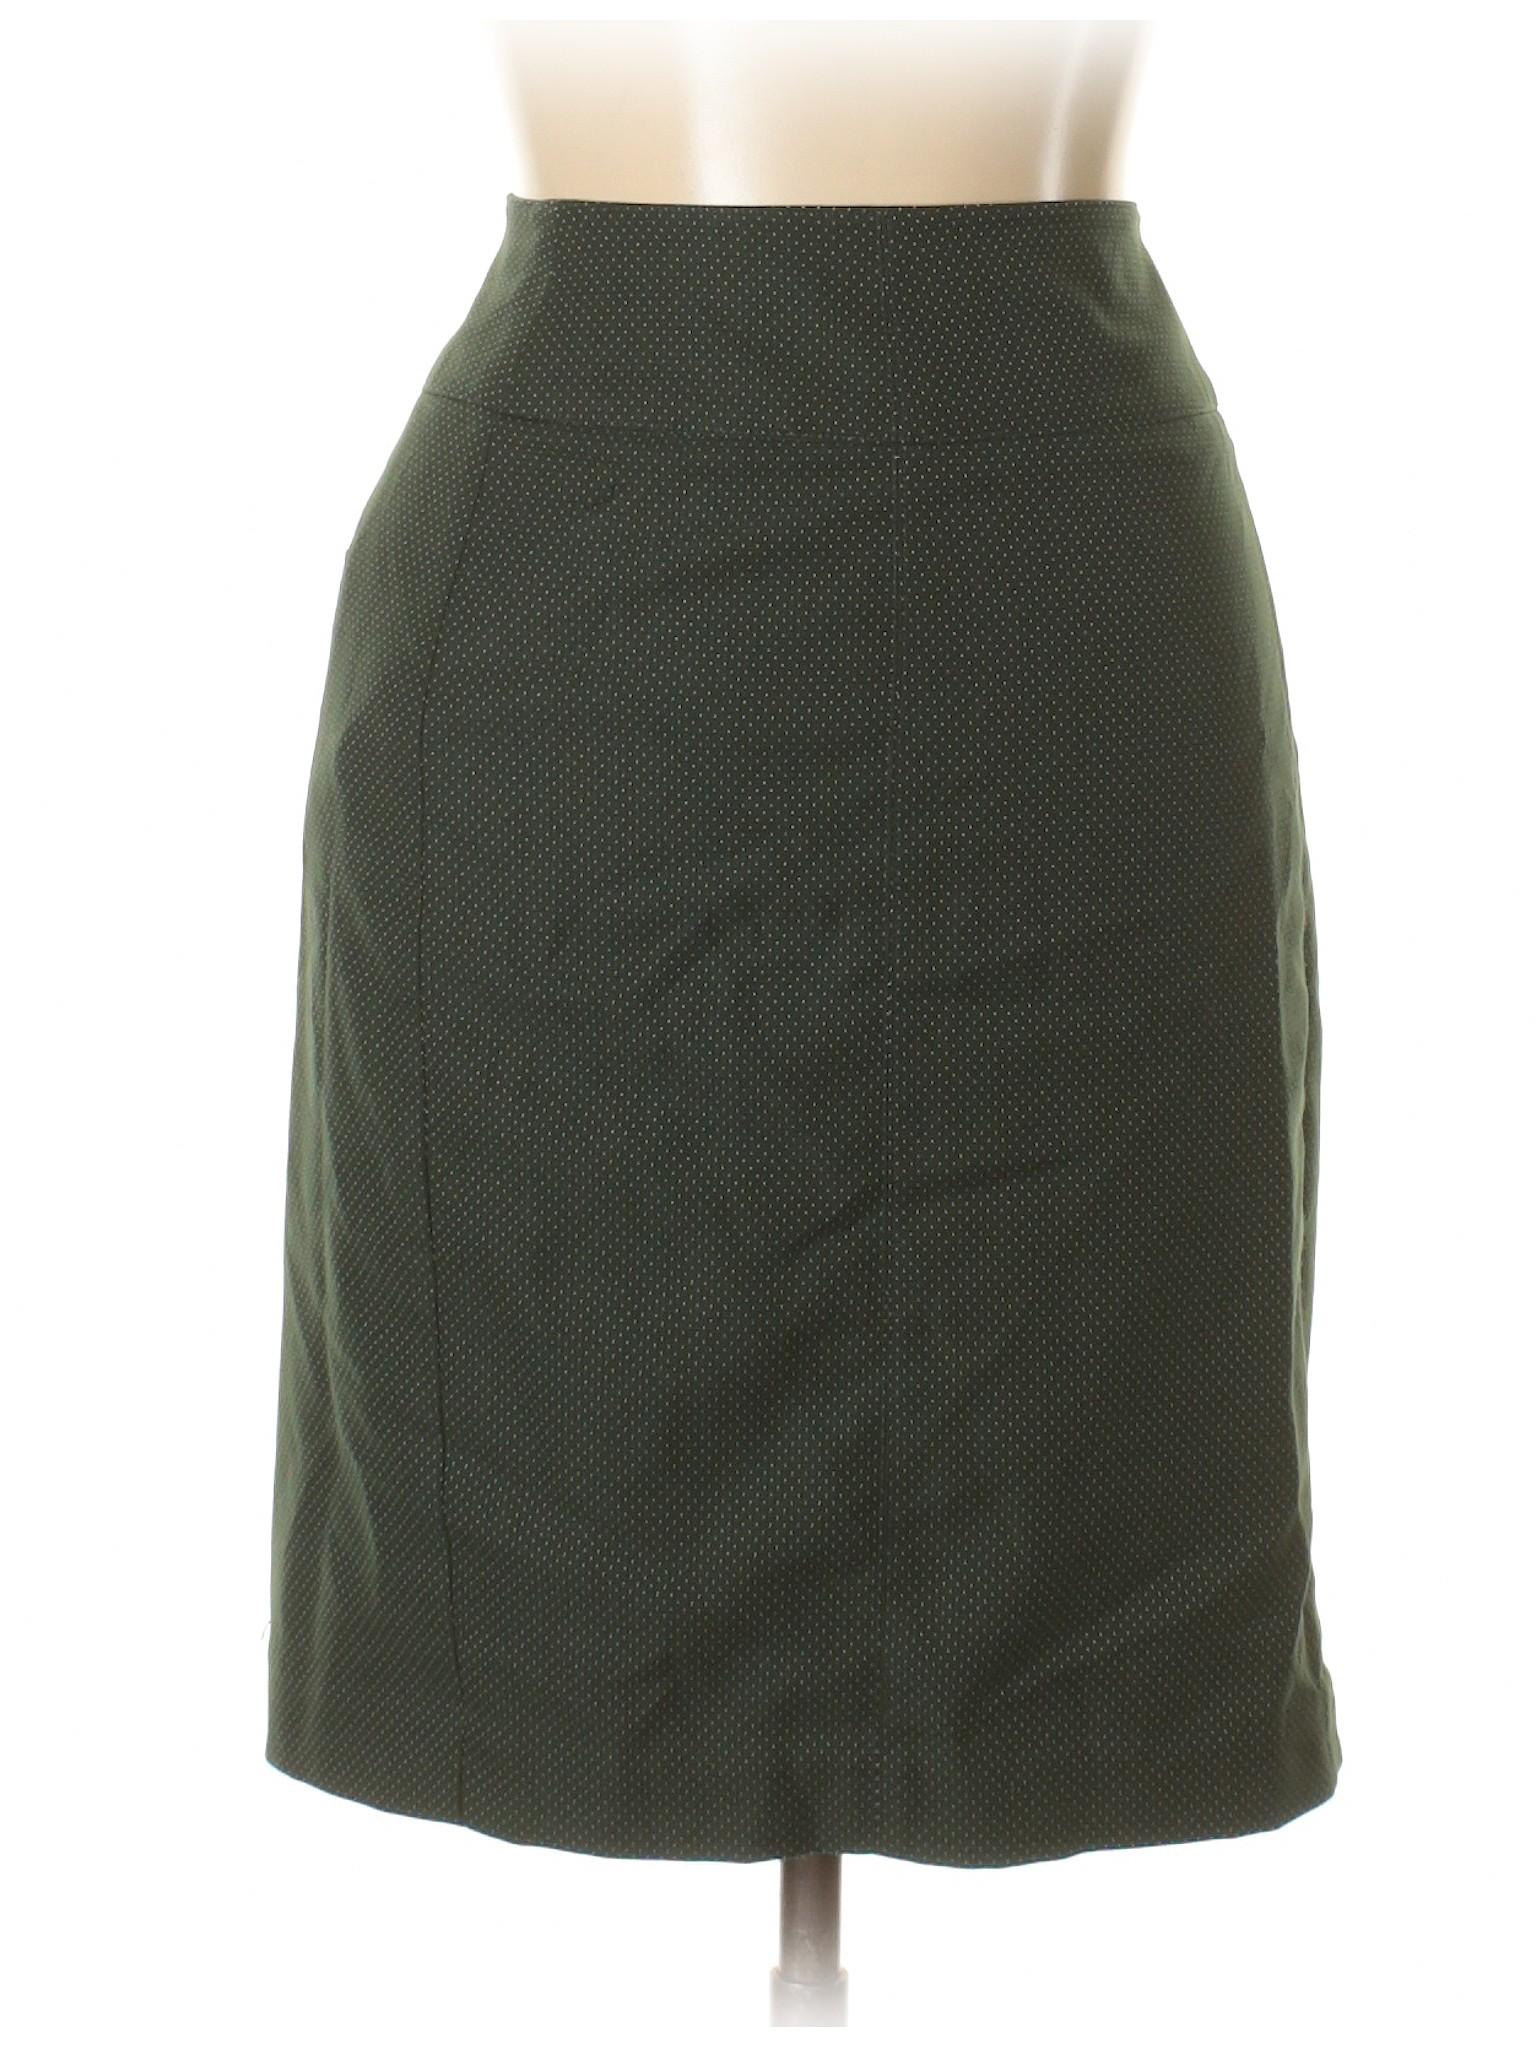 Worthington Leisure Leisure Casual winter Skirt winter wqPZaFPY